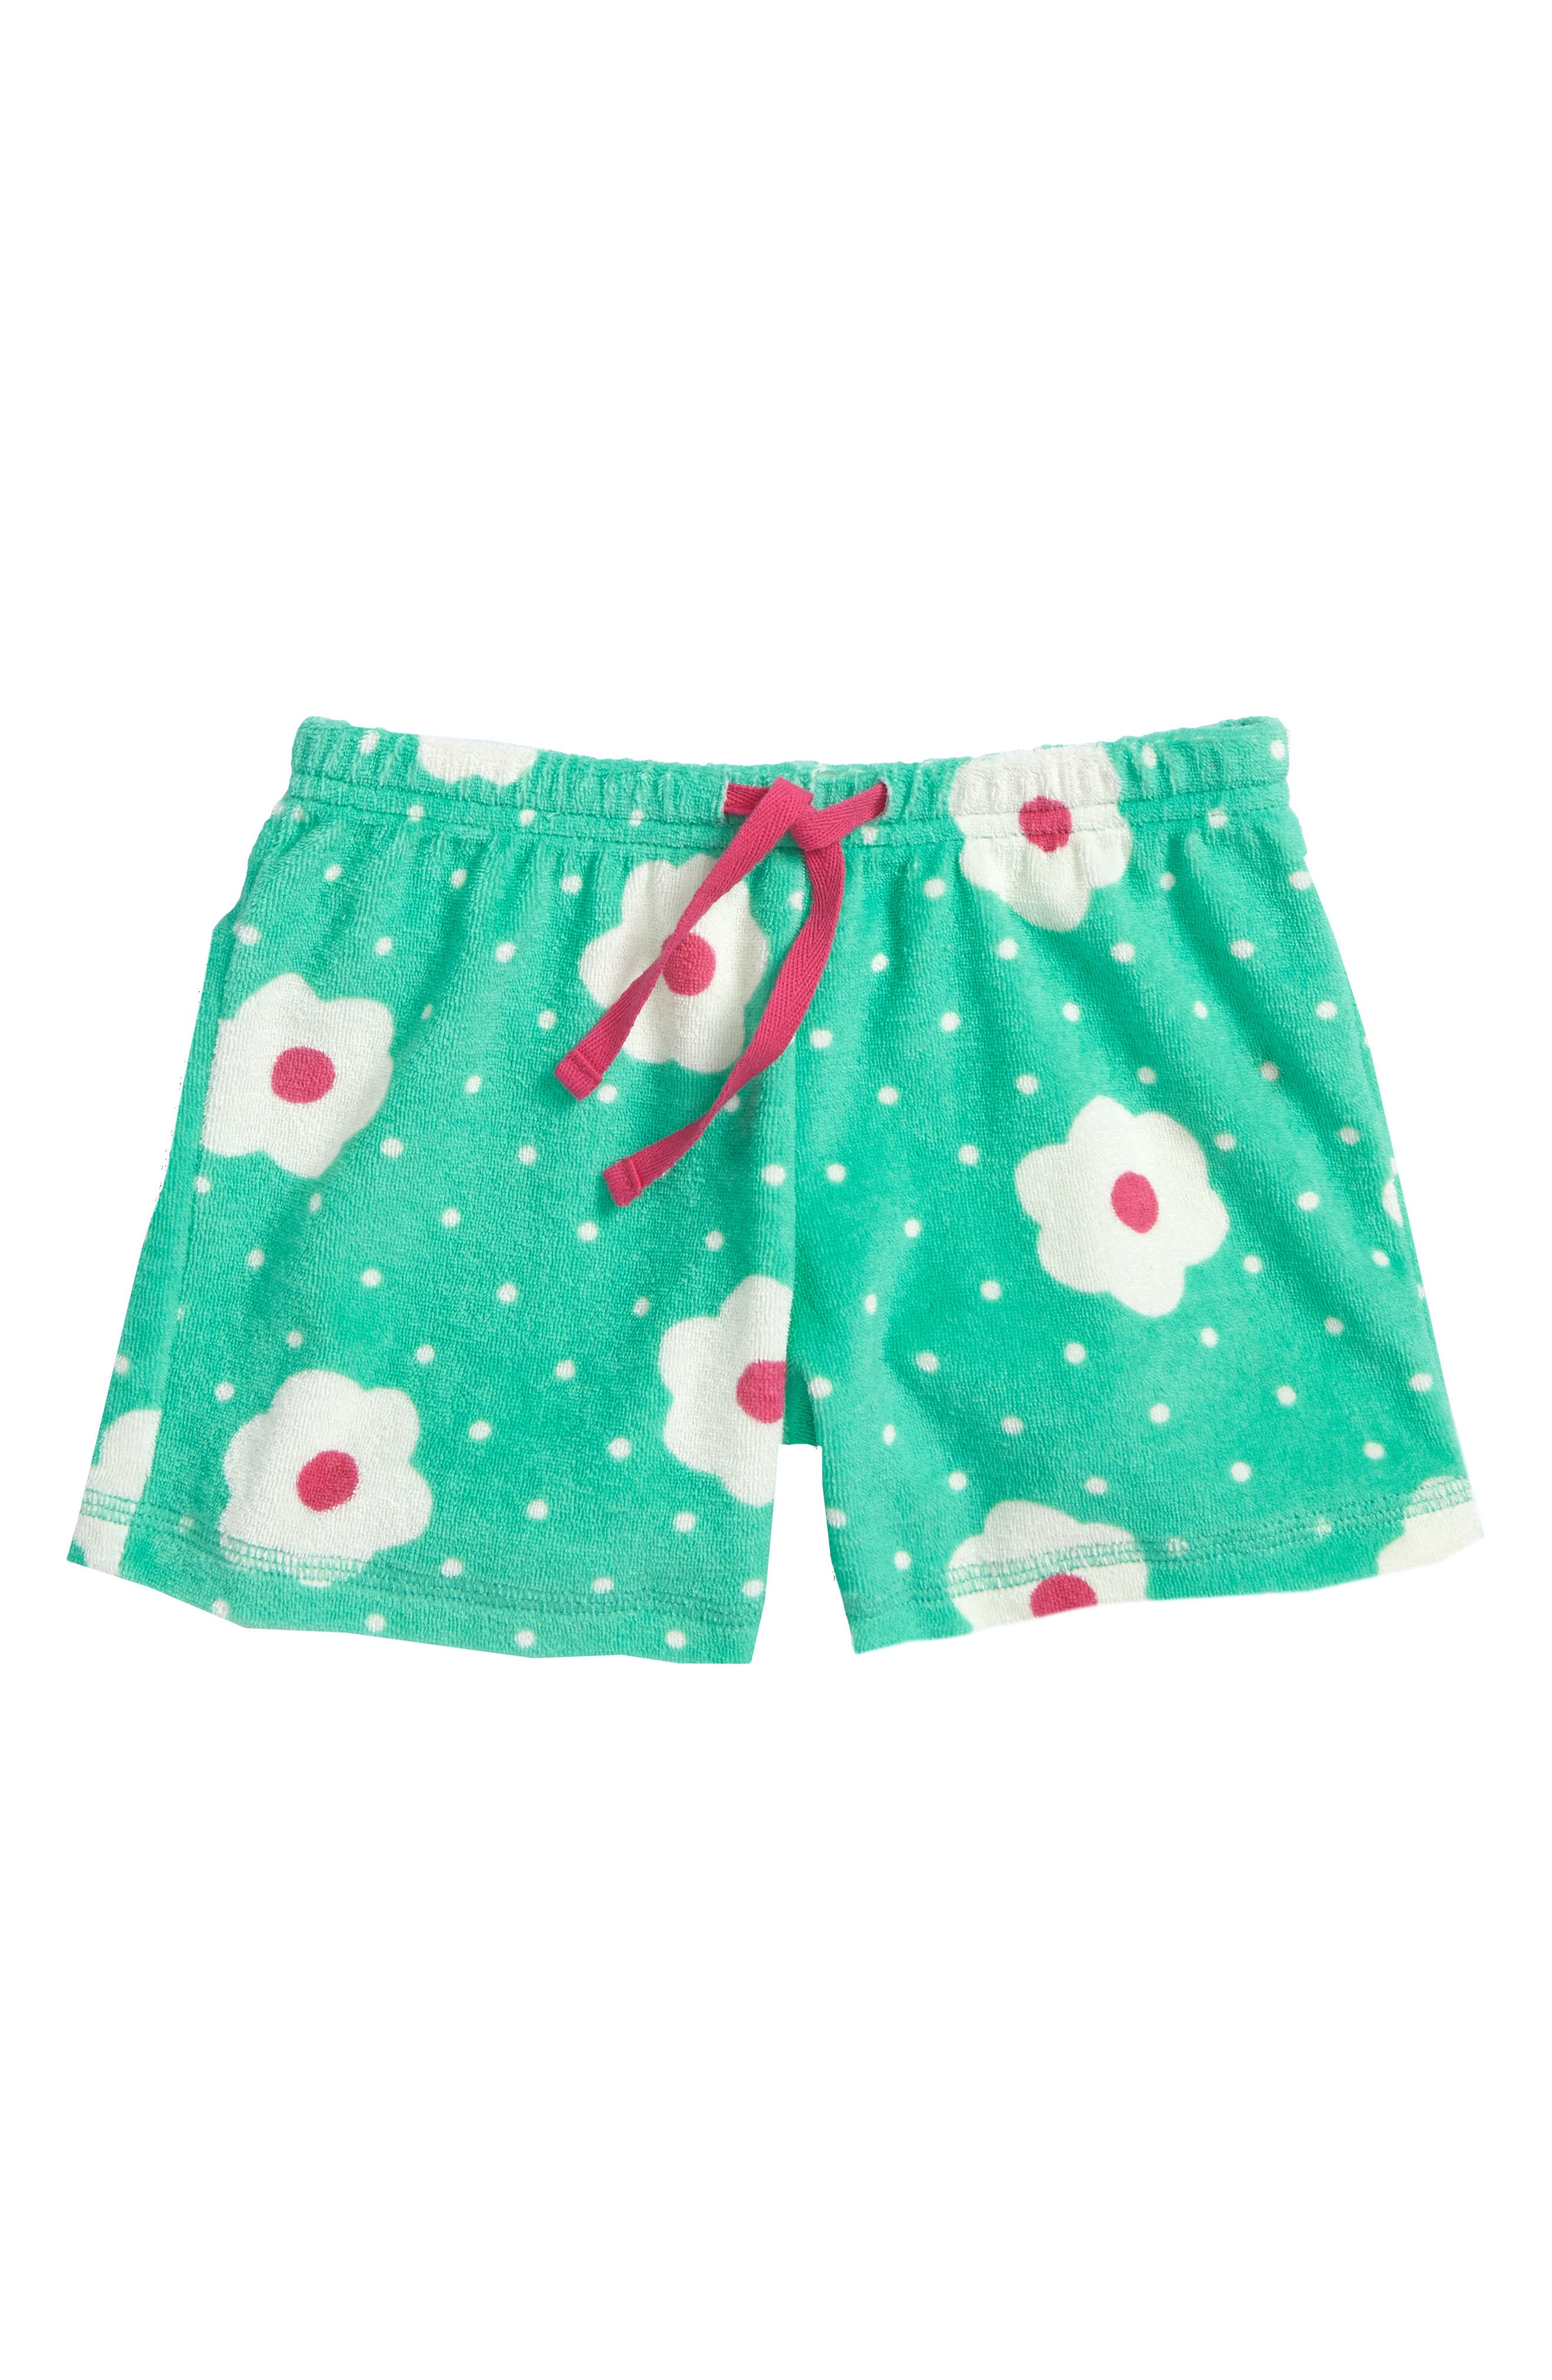 Adventure Toweling Shorts,                             Main thumbnail 1, color,                             315